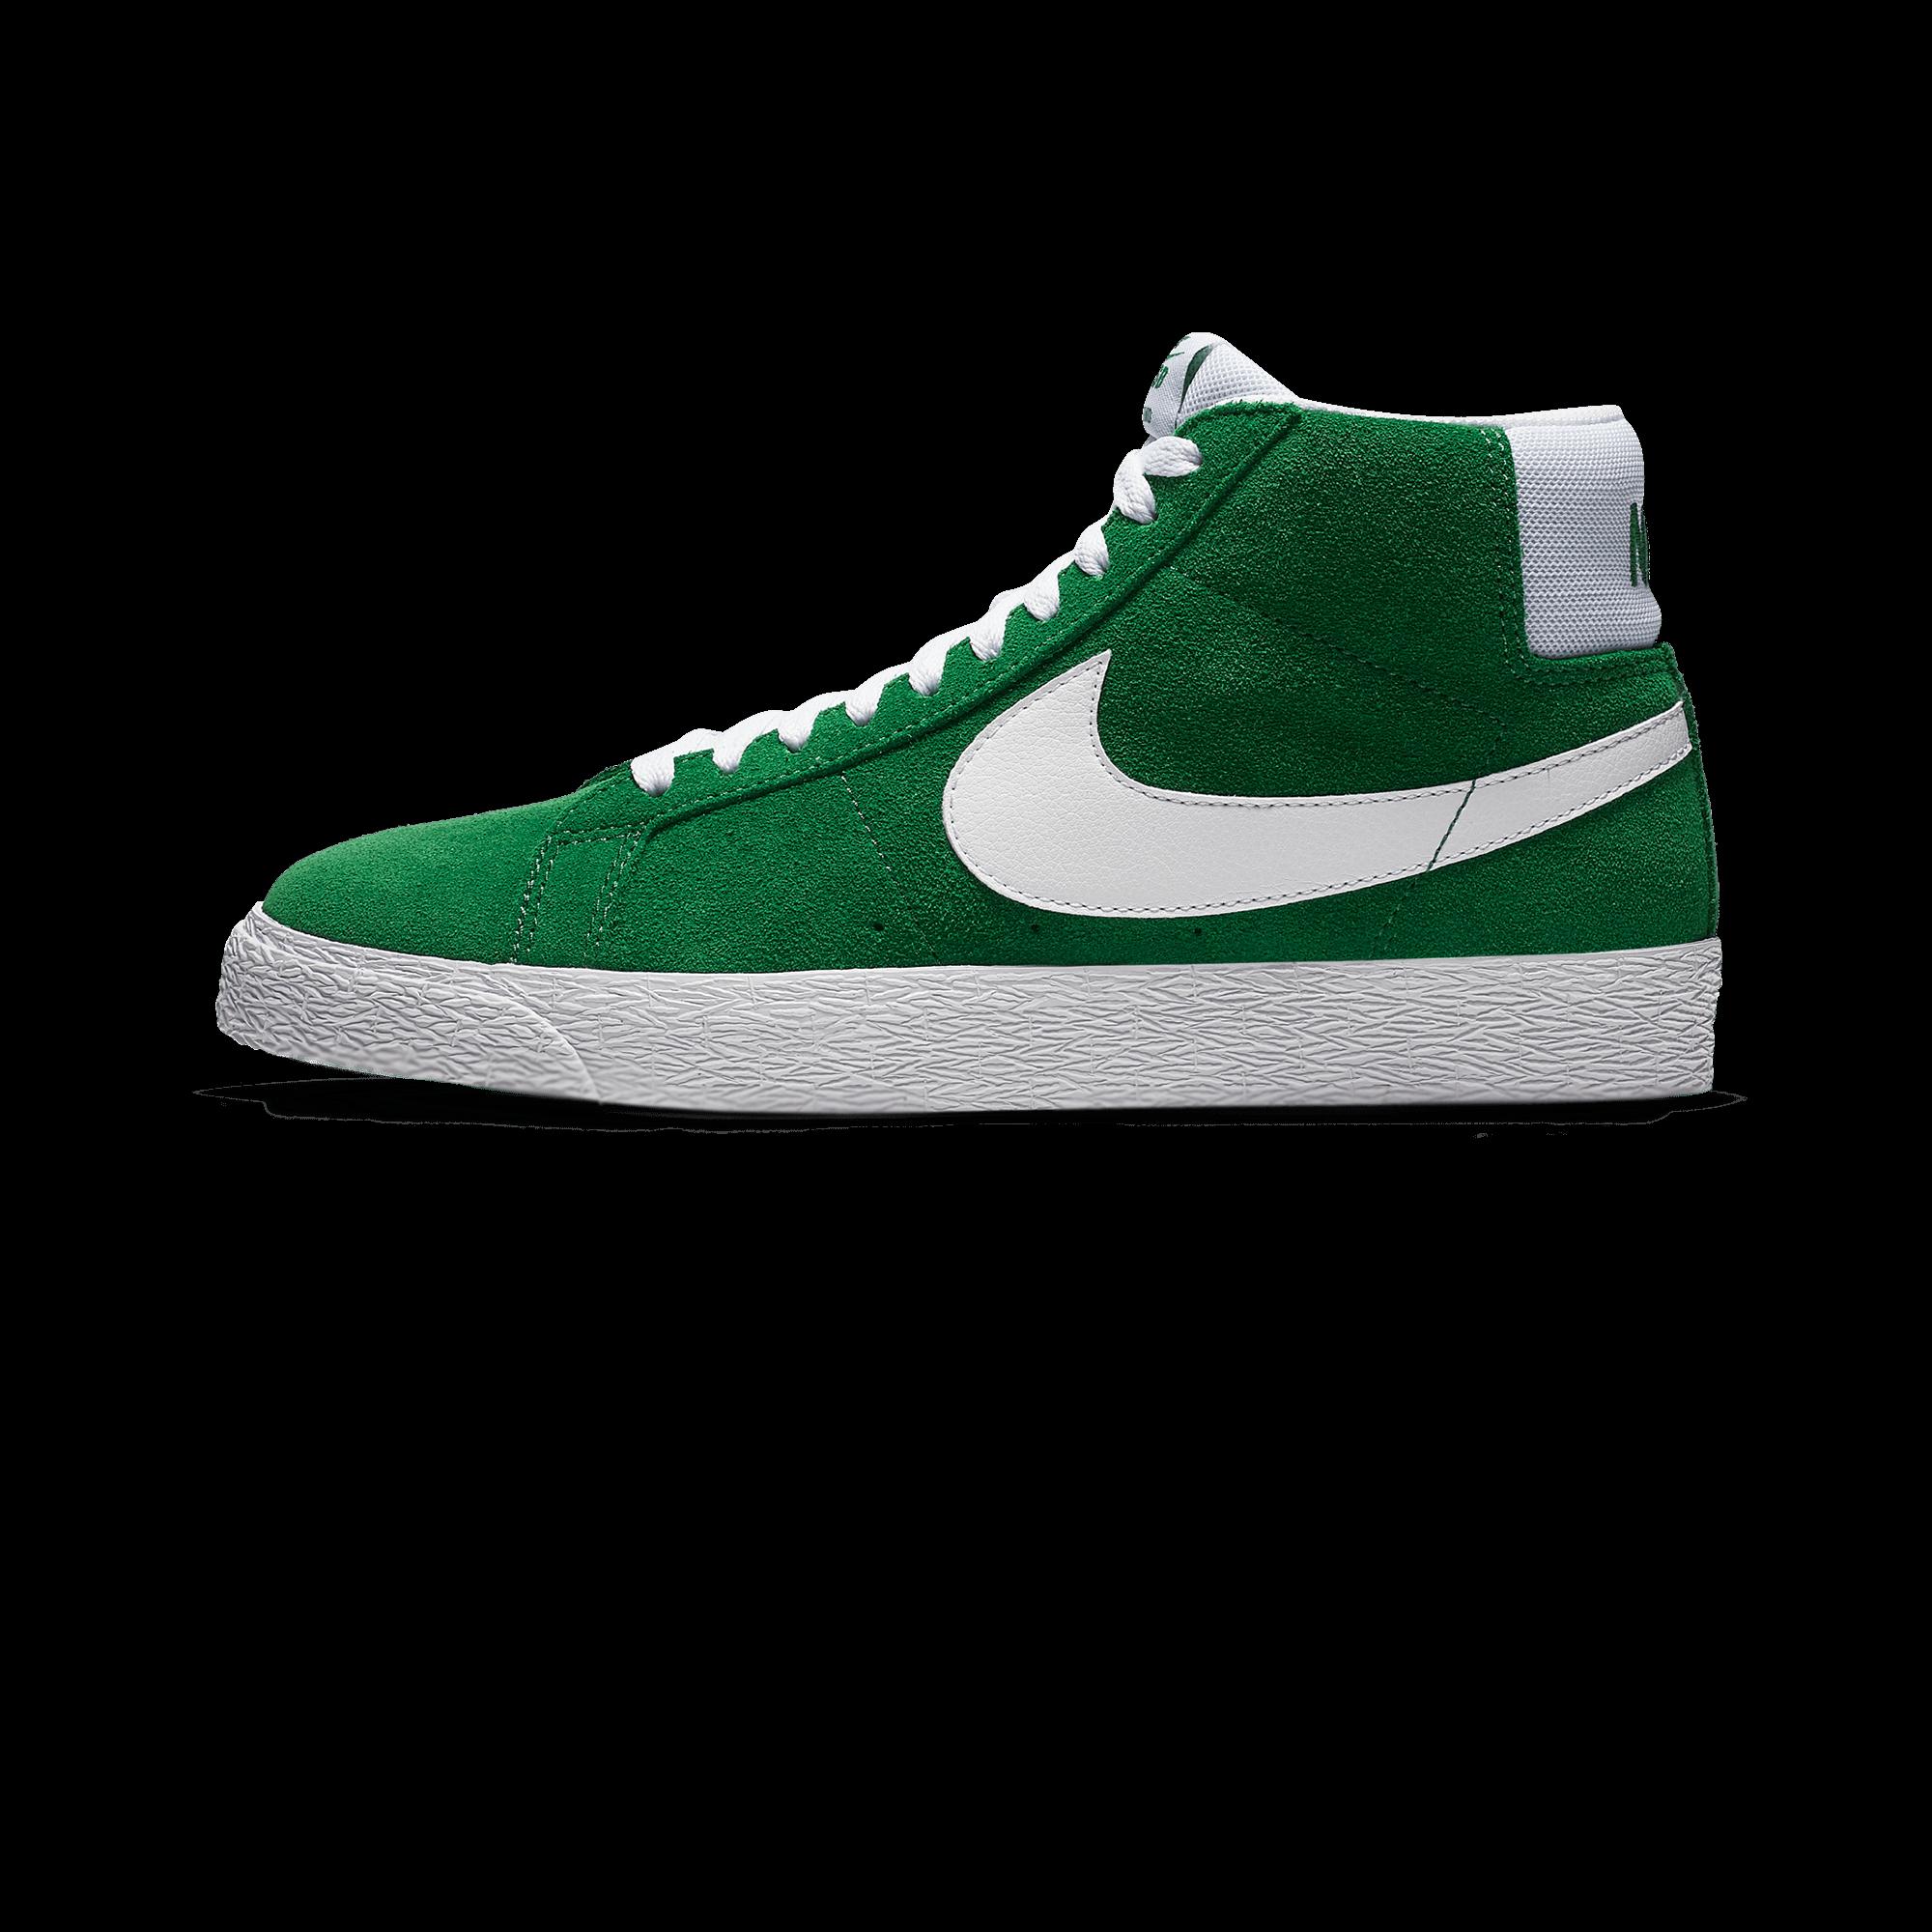 new product e0a5f 0e620 Nike Sb Zoom Blazer Mid pine green/white - Men   Holypopstore.com